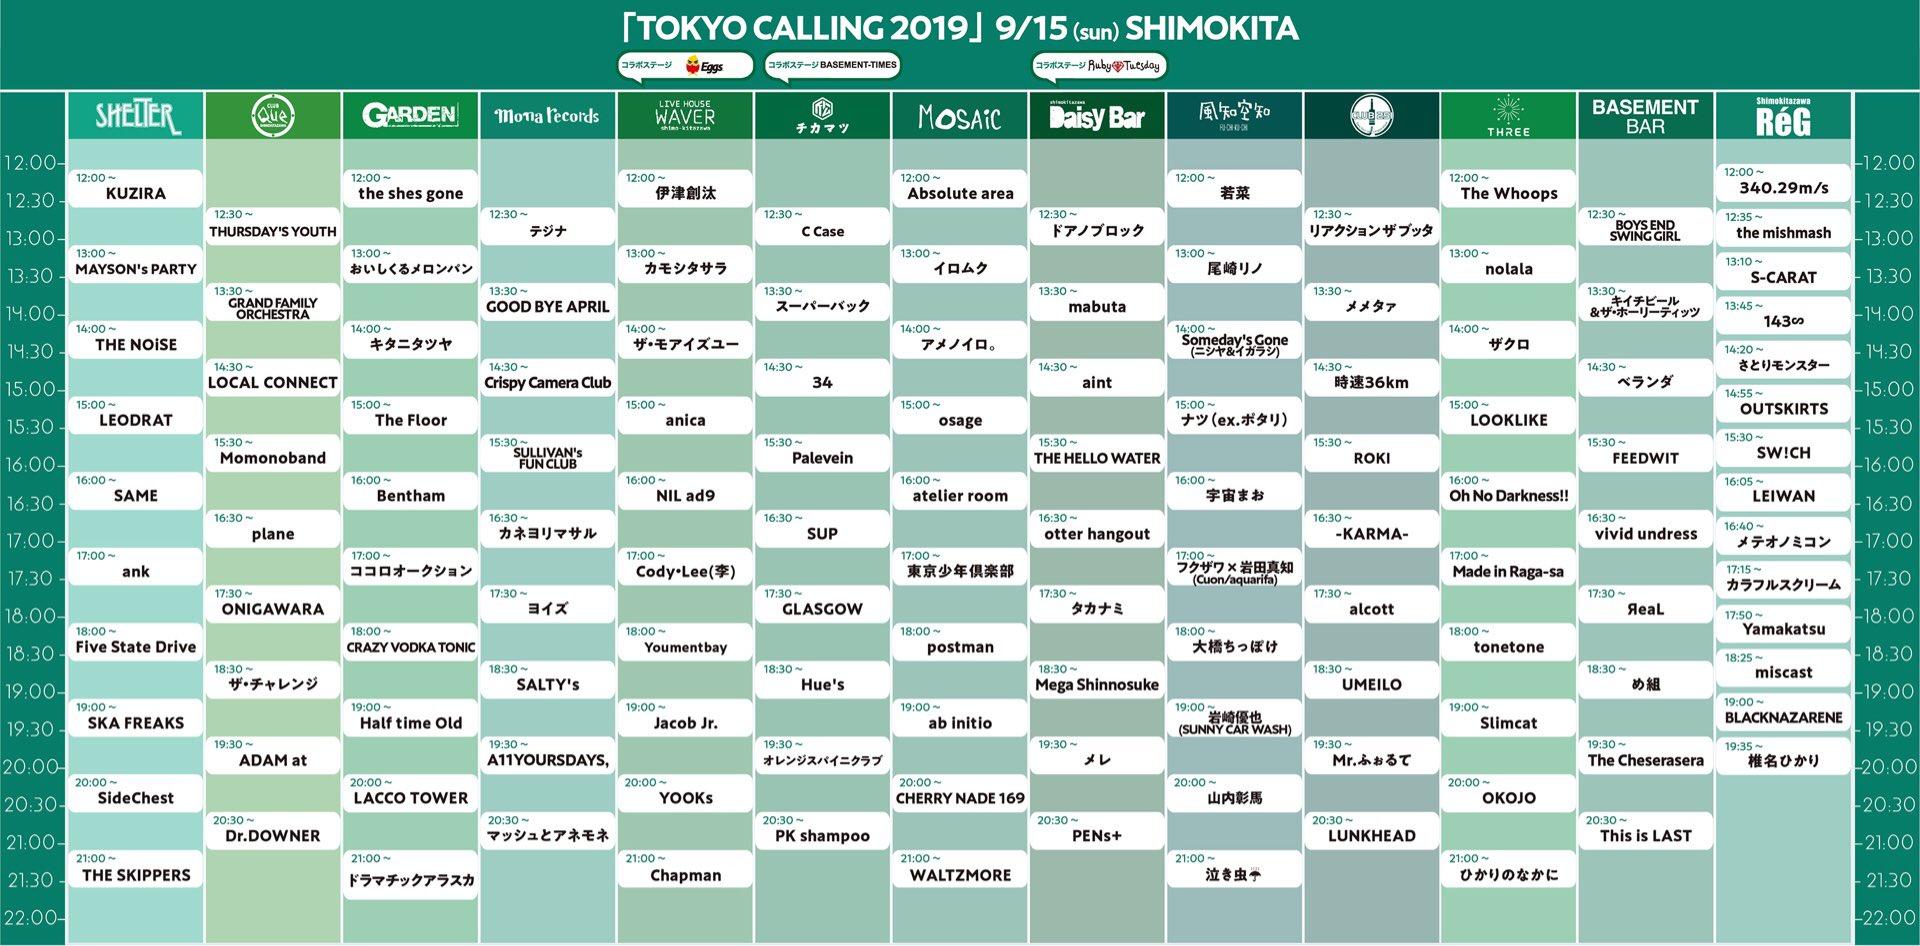 TOKYO CALLING 2019